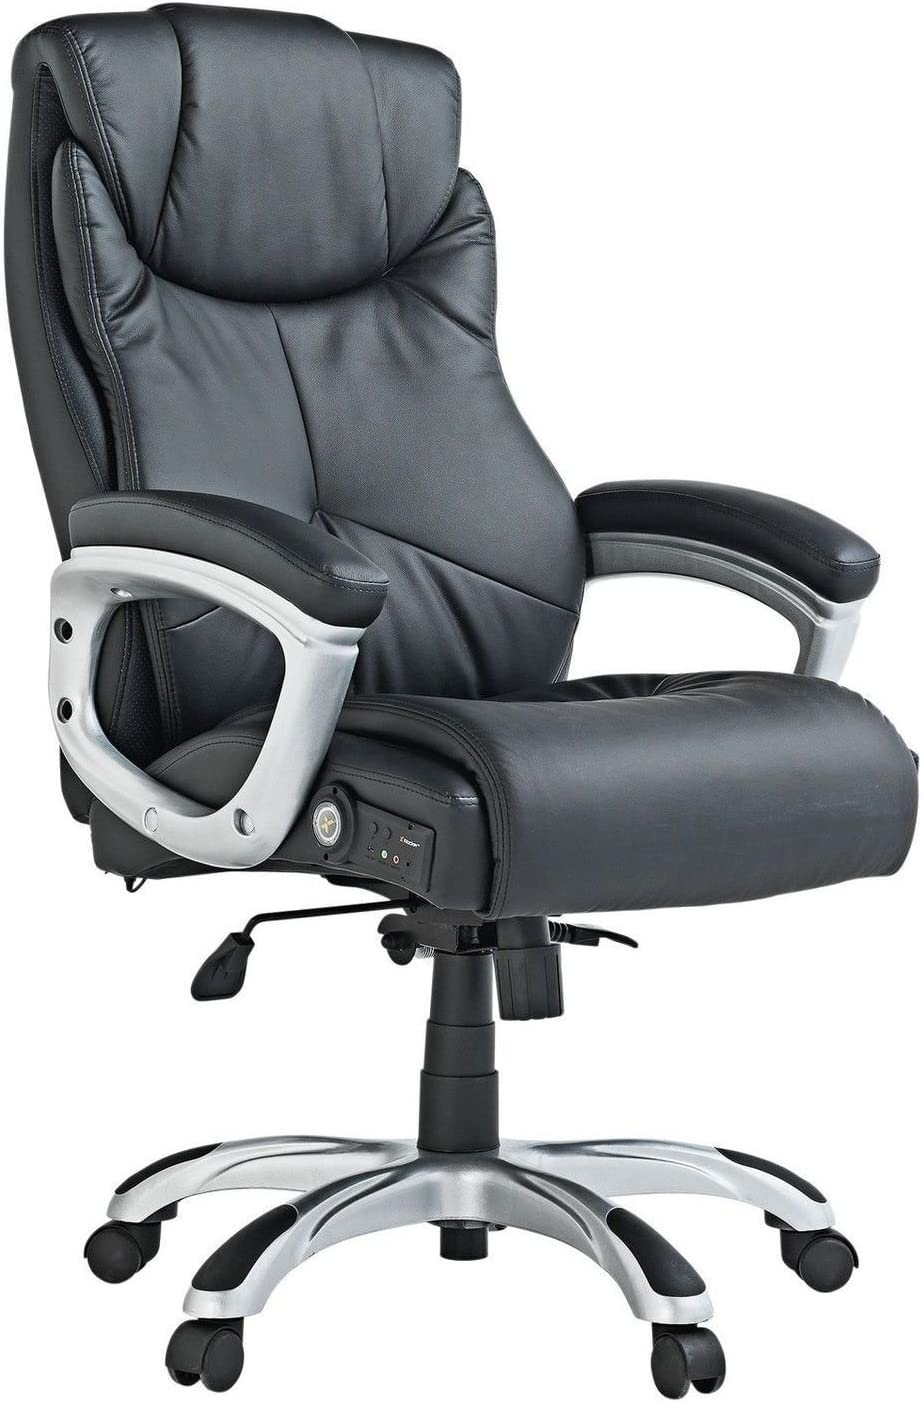 X-Rocker Executive 6.6 Wireless Gaming Chair: Amazon.co.uk